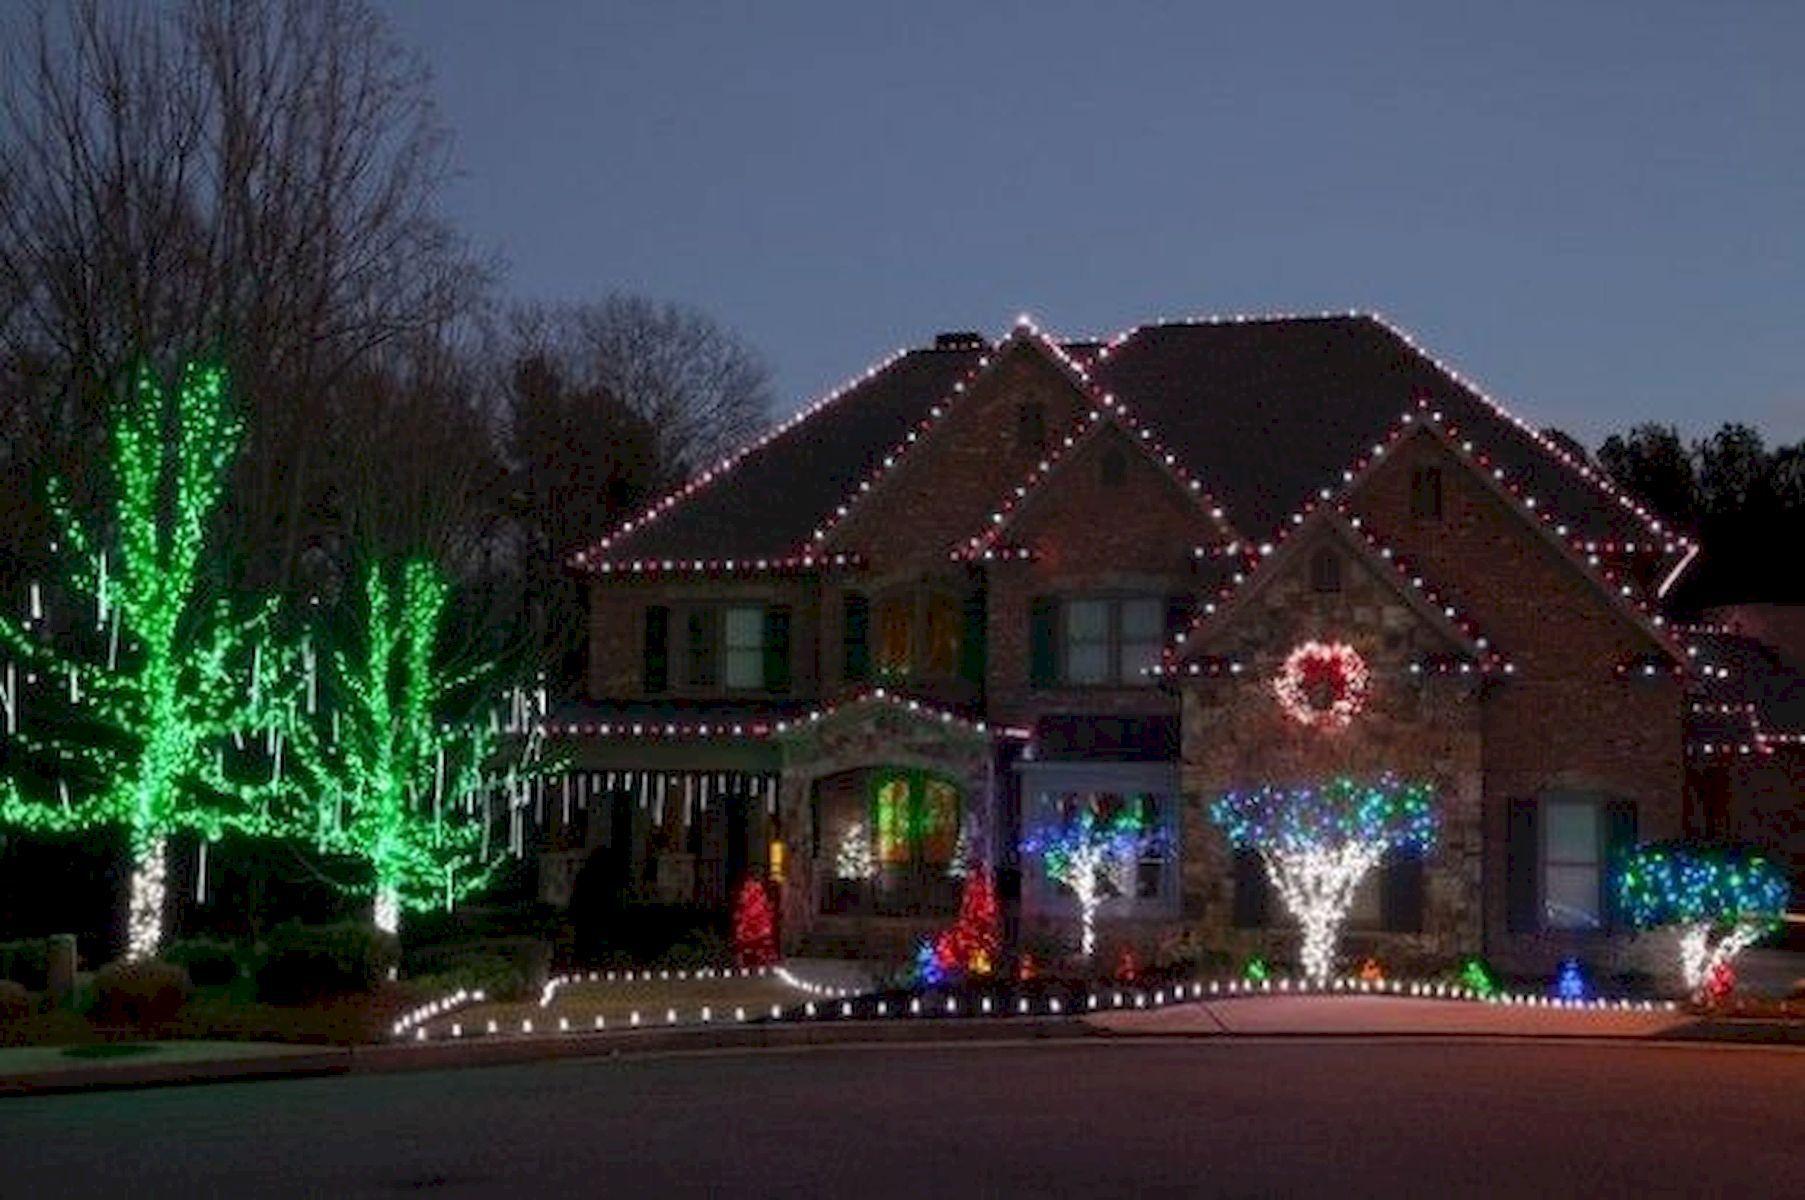 xmas lighting ideas outdoor christmas lights adorable outdoor christmas lighting ideas will you take deep breath httpshajarfresh outdoor